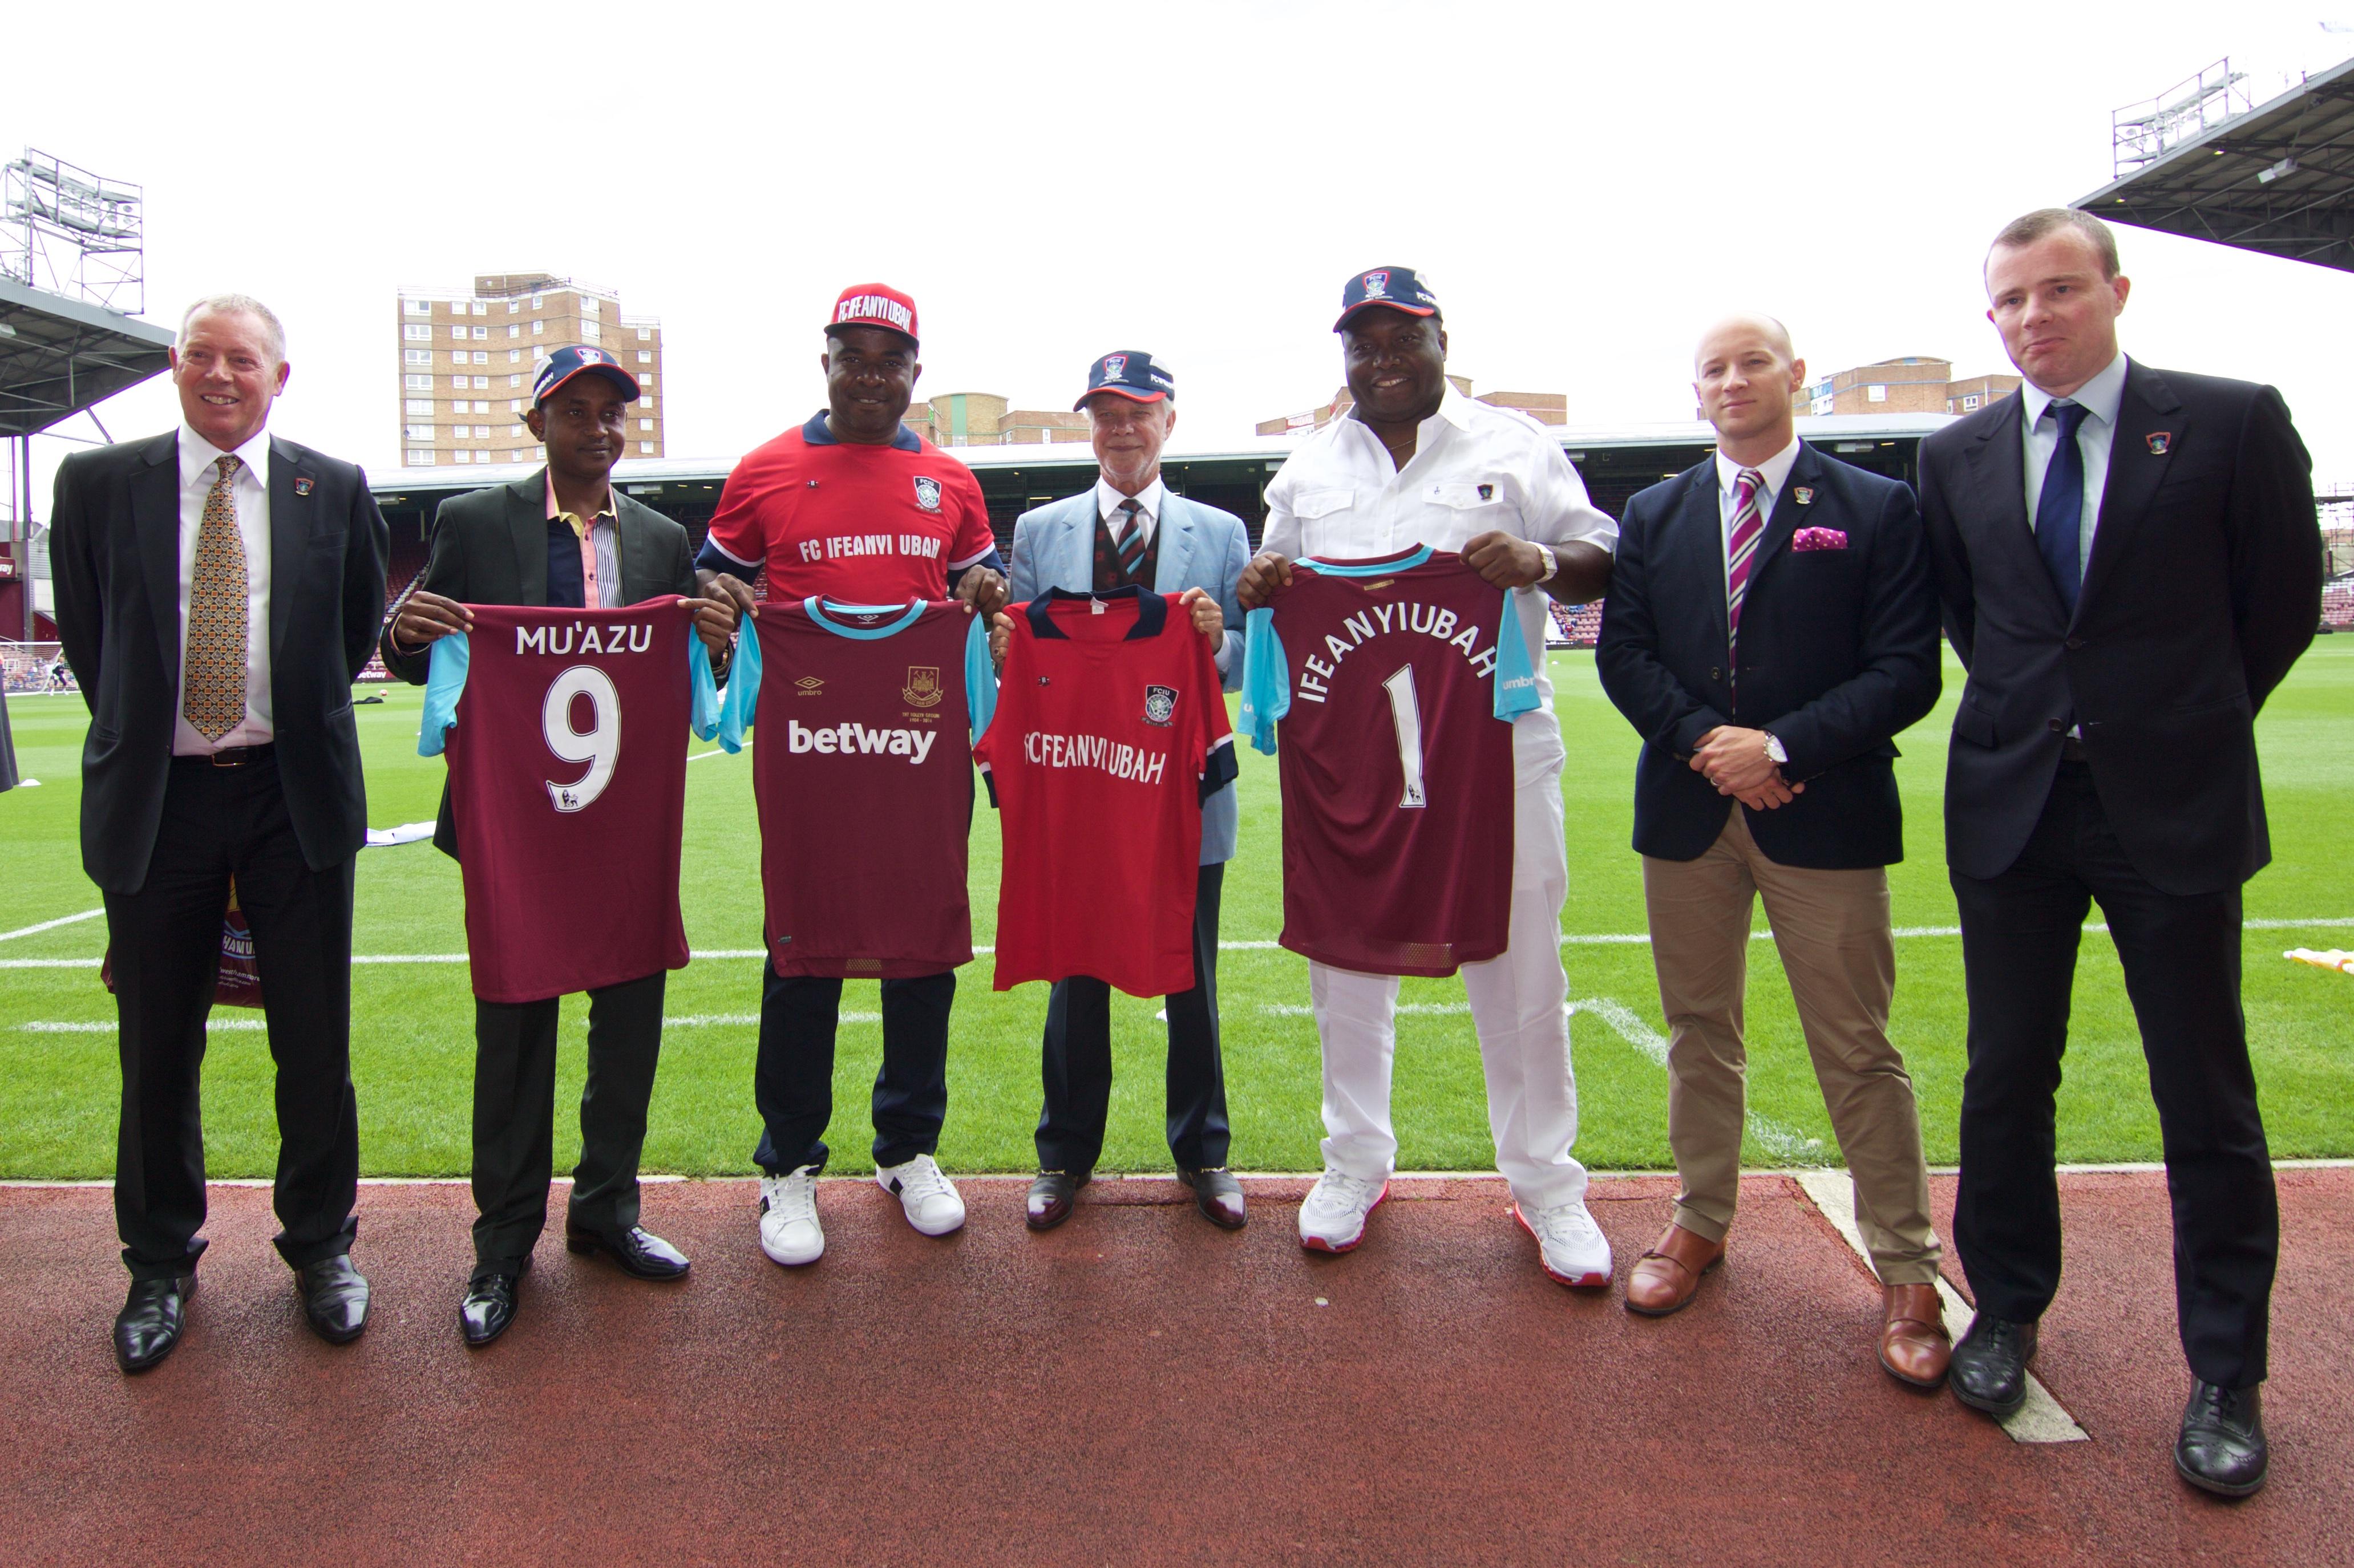 File:FC IFEANYI UBAH visit to WestHam United fc......... 9.jpg - Wikimedia Commons